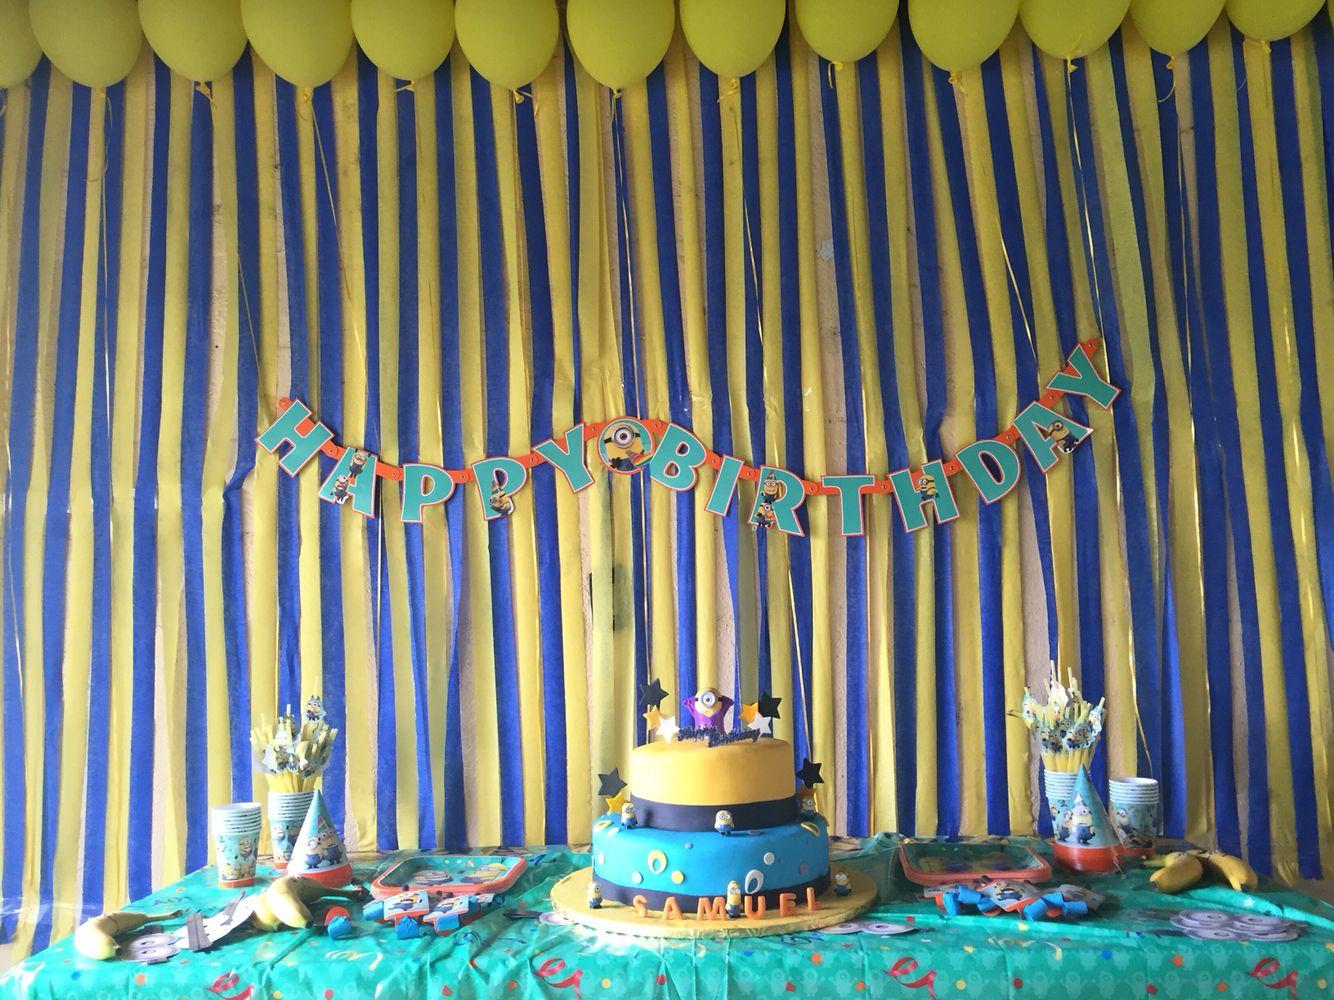 My son Sammy's 1st birthday party. #minions